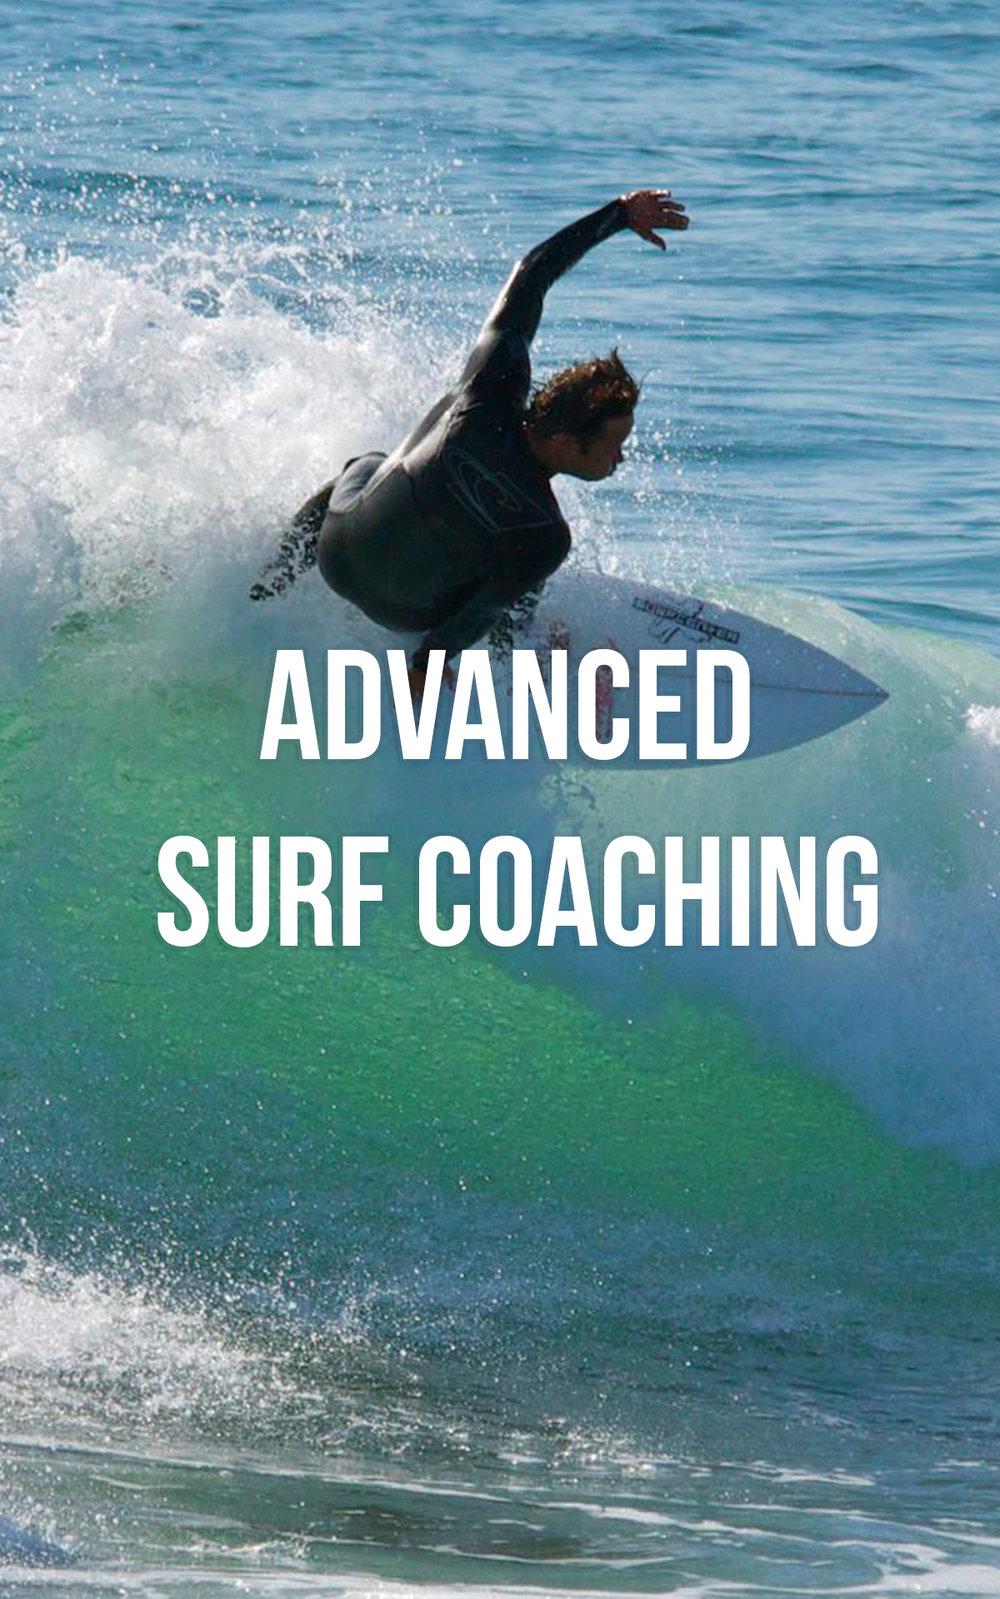 Advanced Surf Coaching.jpg